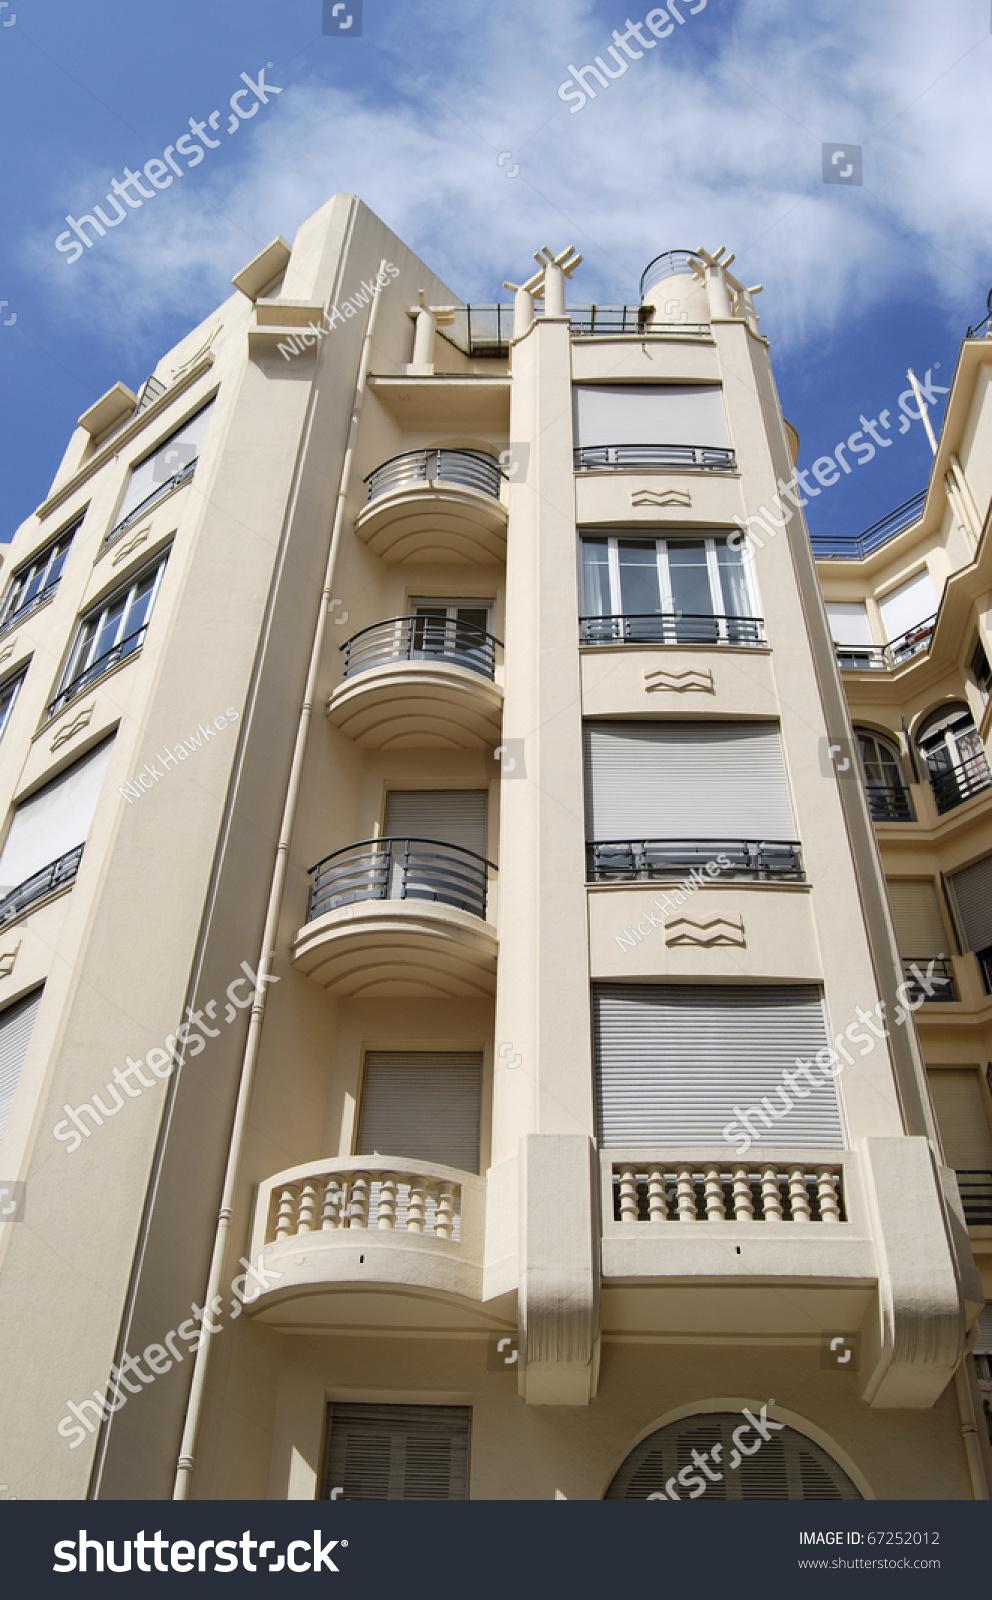 Art deco style apartment building nice cote d 39 azur for Nice building images